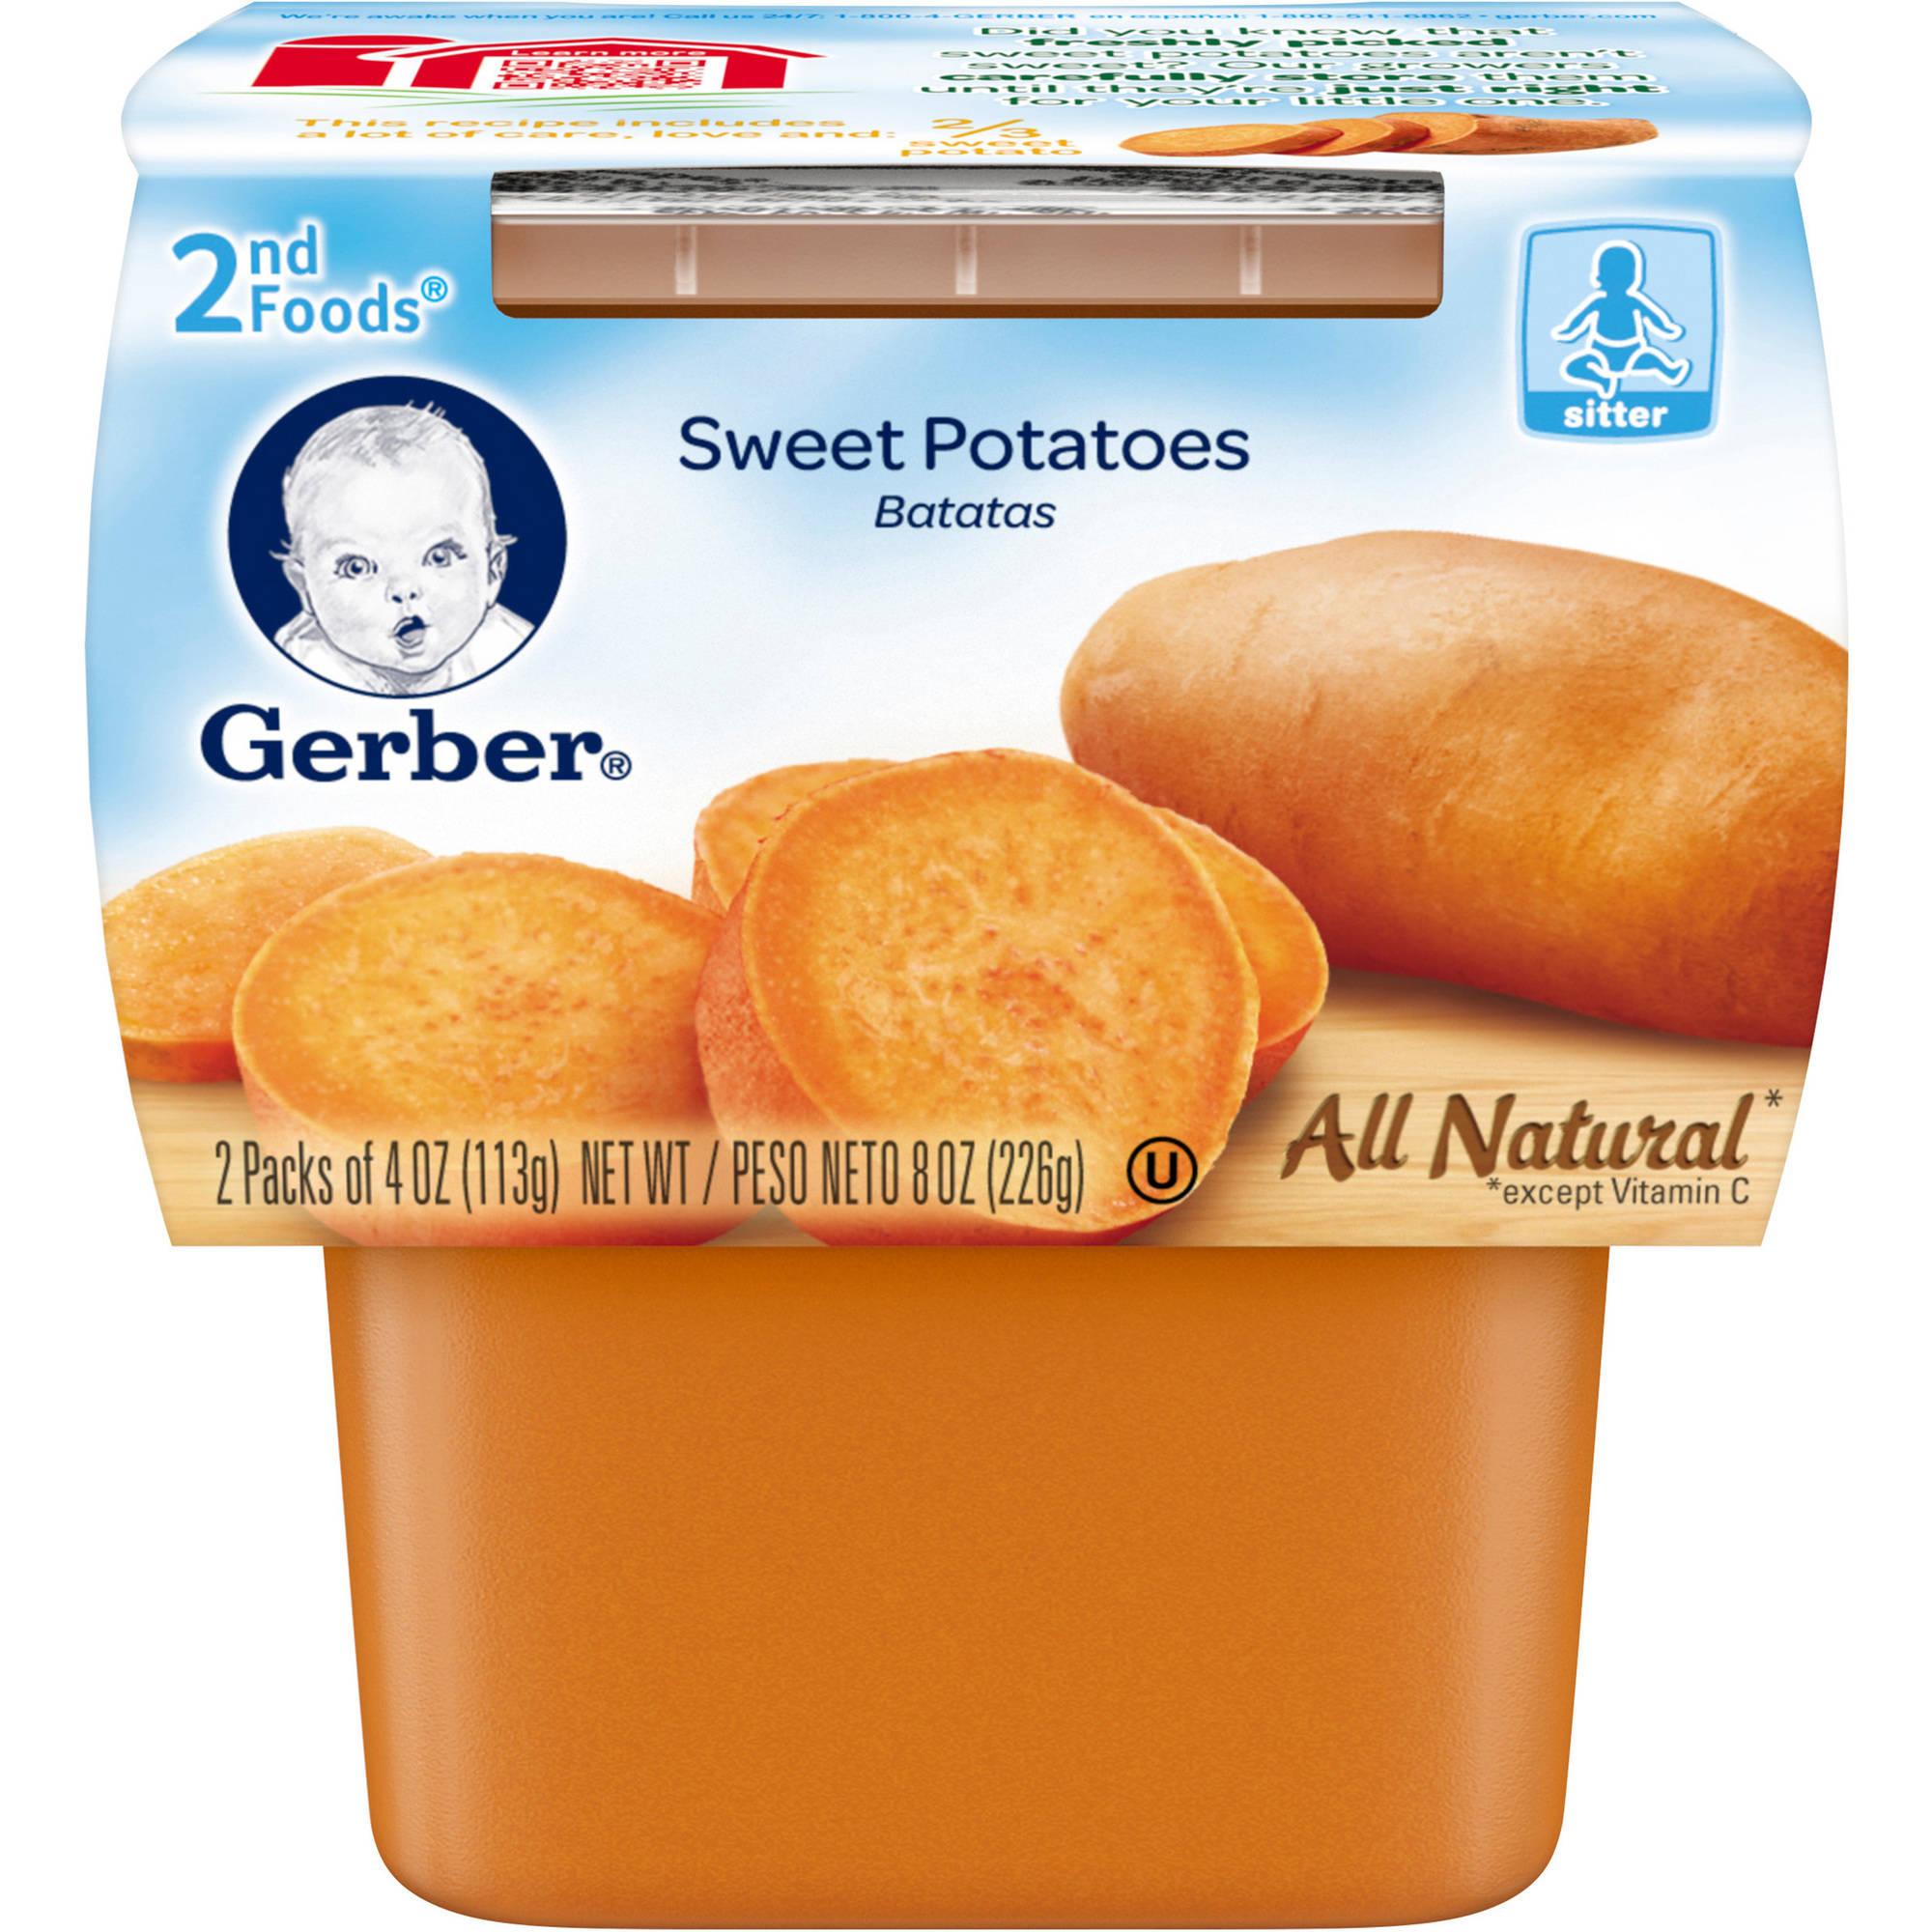 Gerber 2nd Foods Sweet Potatoes Baby Food, 4 oz, 2 count, (Pack of 8)